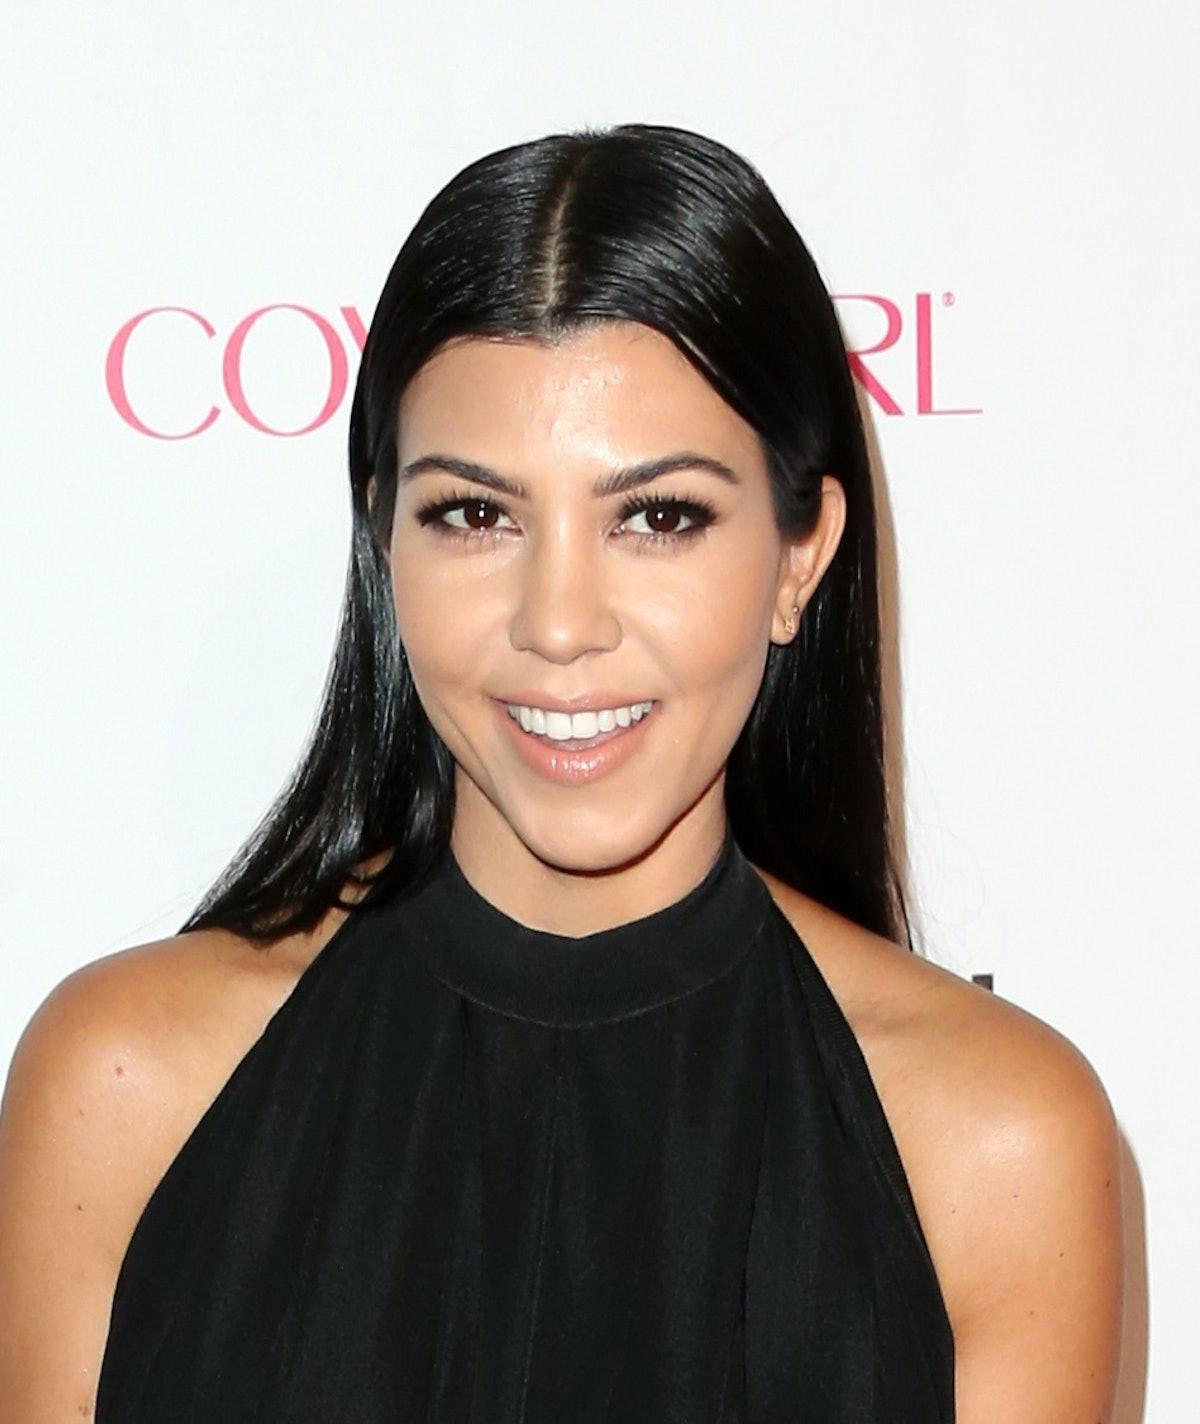 WEST HOLLYWOOD, CA - OCTOBER 12:  TV personality Kourtney Kardashian attends Cosmopolitan's 50th Bir...